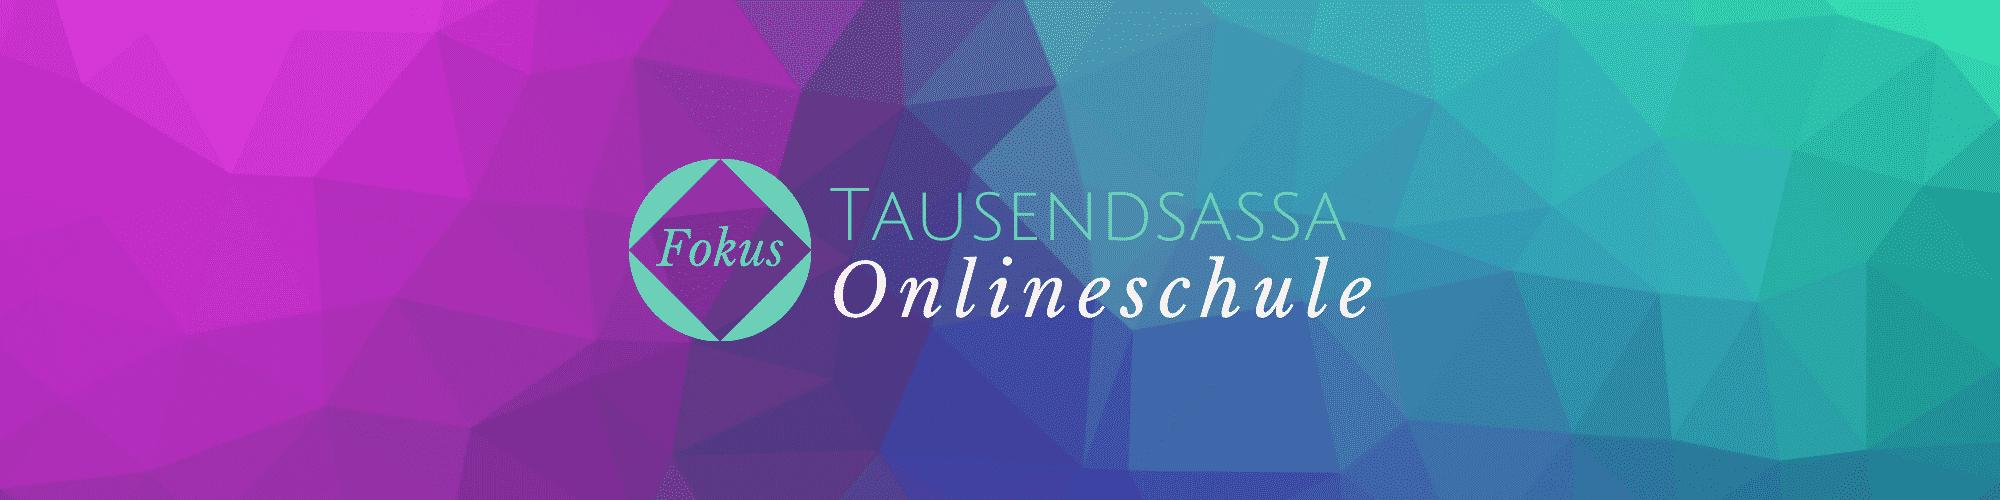 Header Tausendsassa Onlineschule Fokus